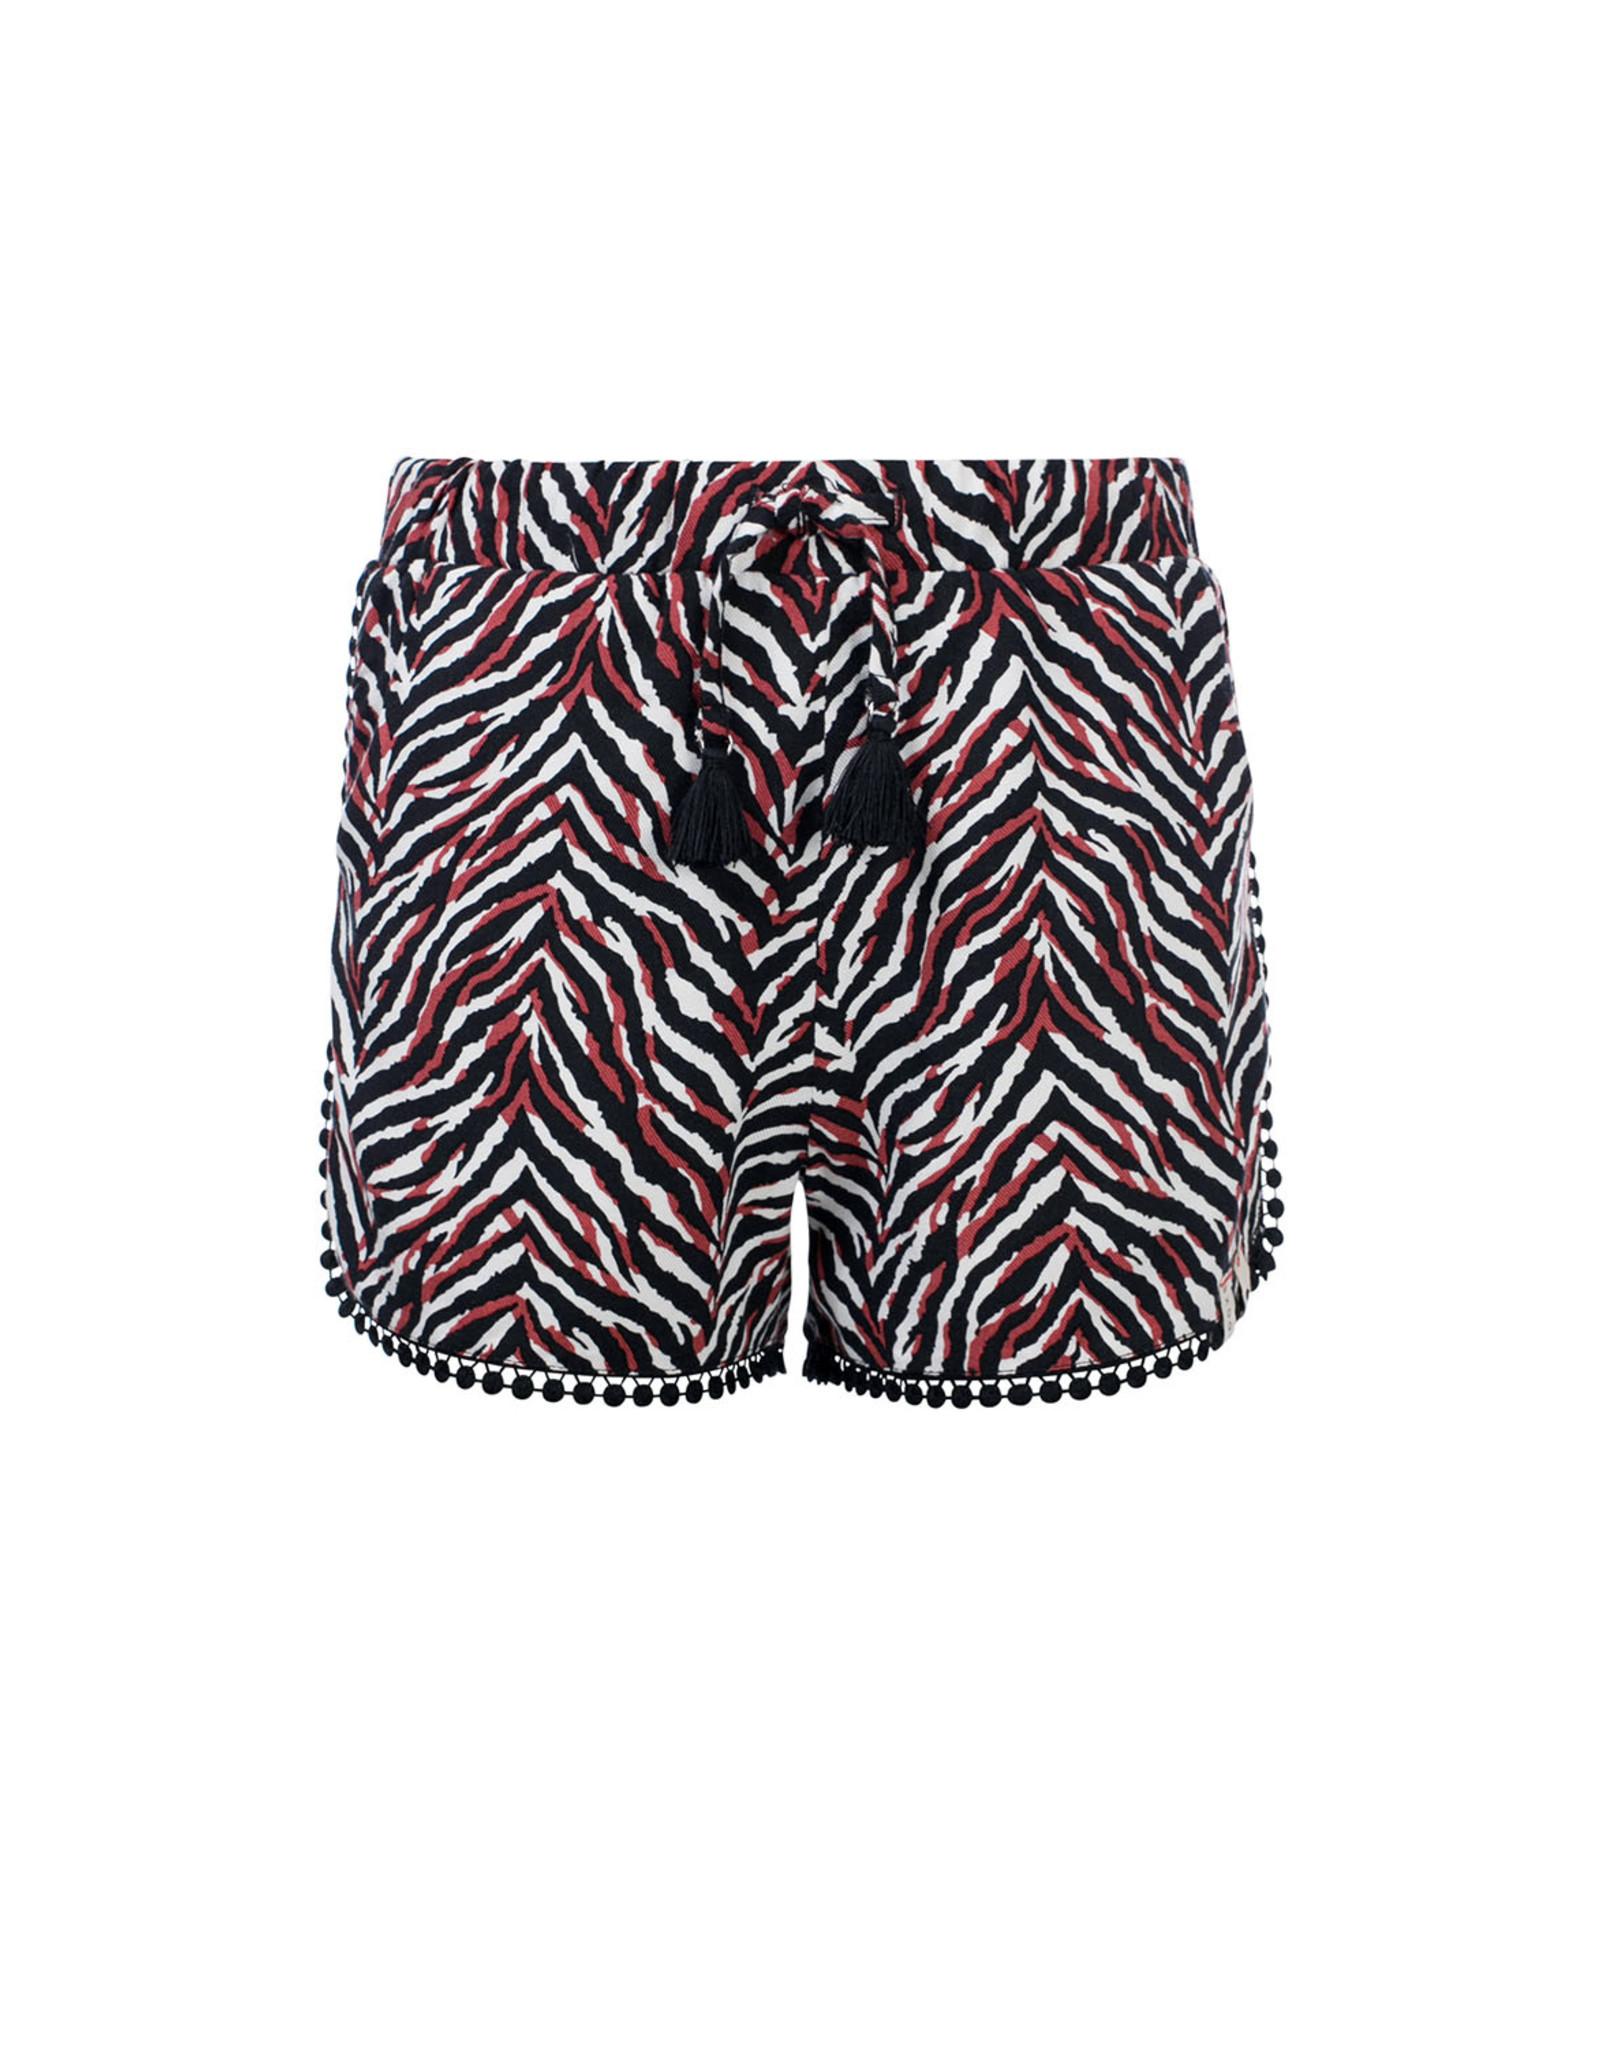 Looxs 10SIXTEEN 10Sixteen Woven printed shorts zebra